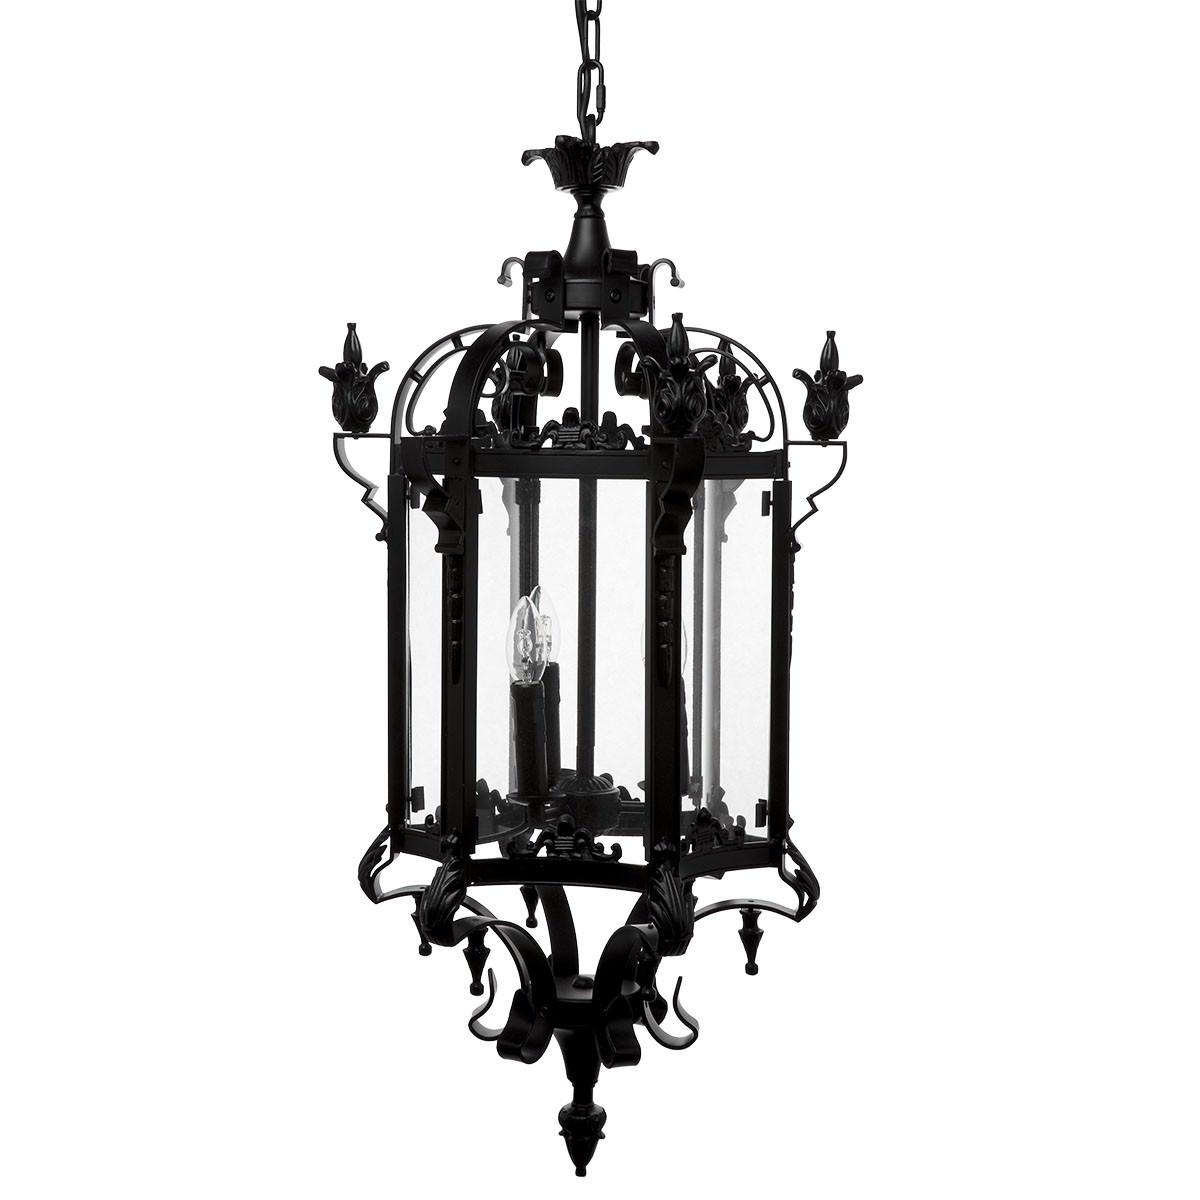 Buatta Iron & Glass Pendant Light, Medium